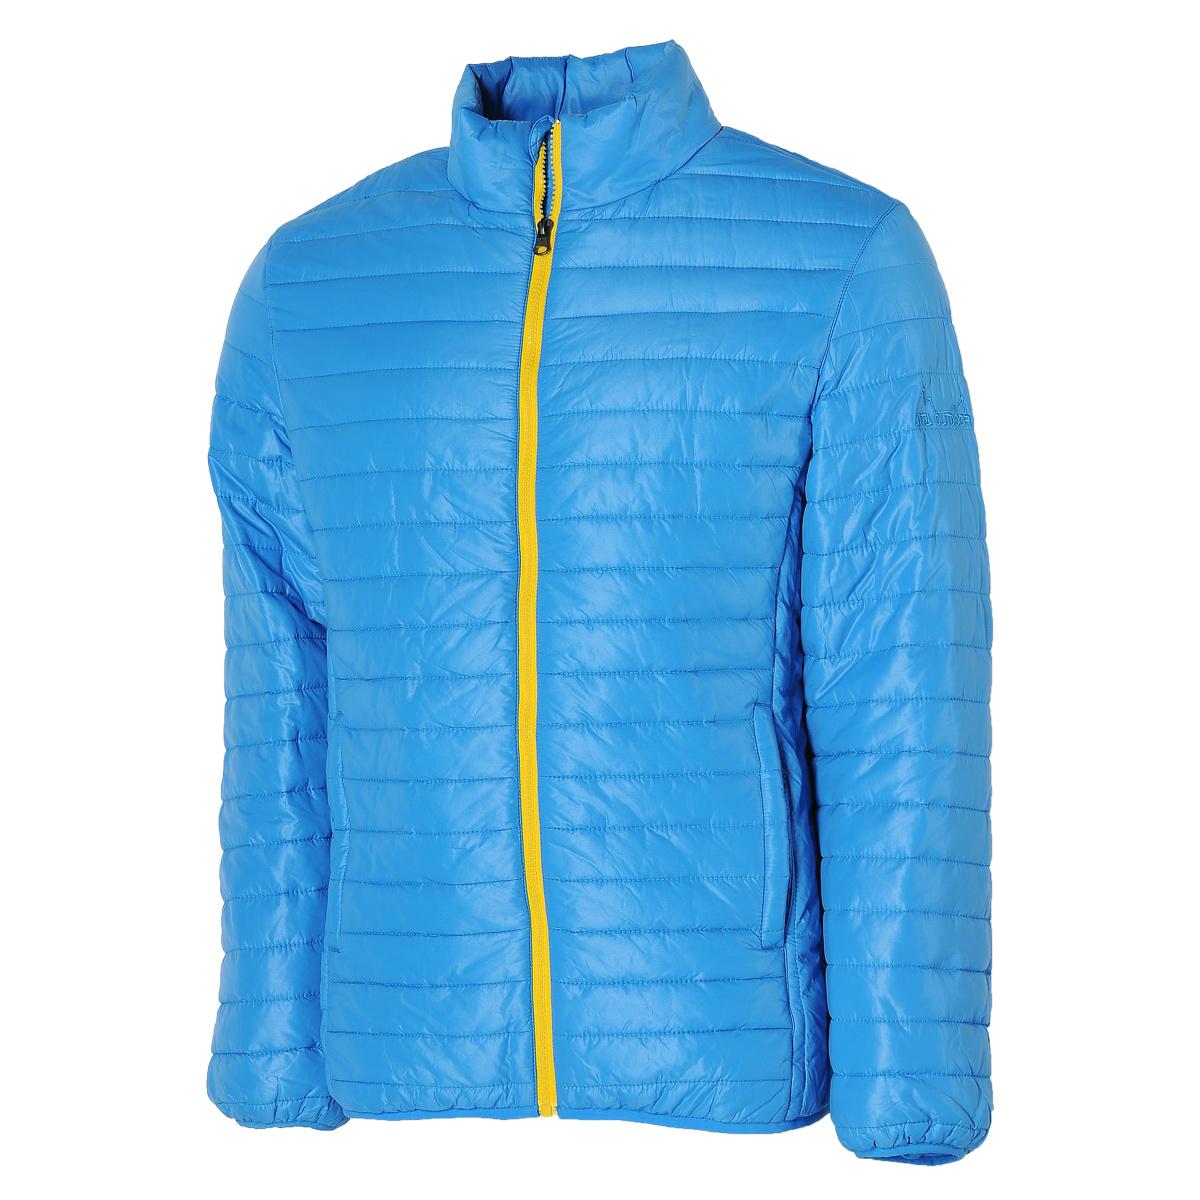 Куртка, Спортивный костюм Anta 15146841 -1-3